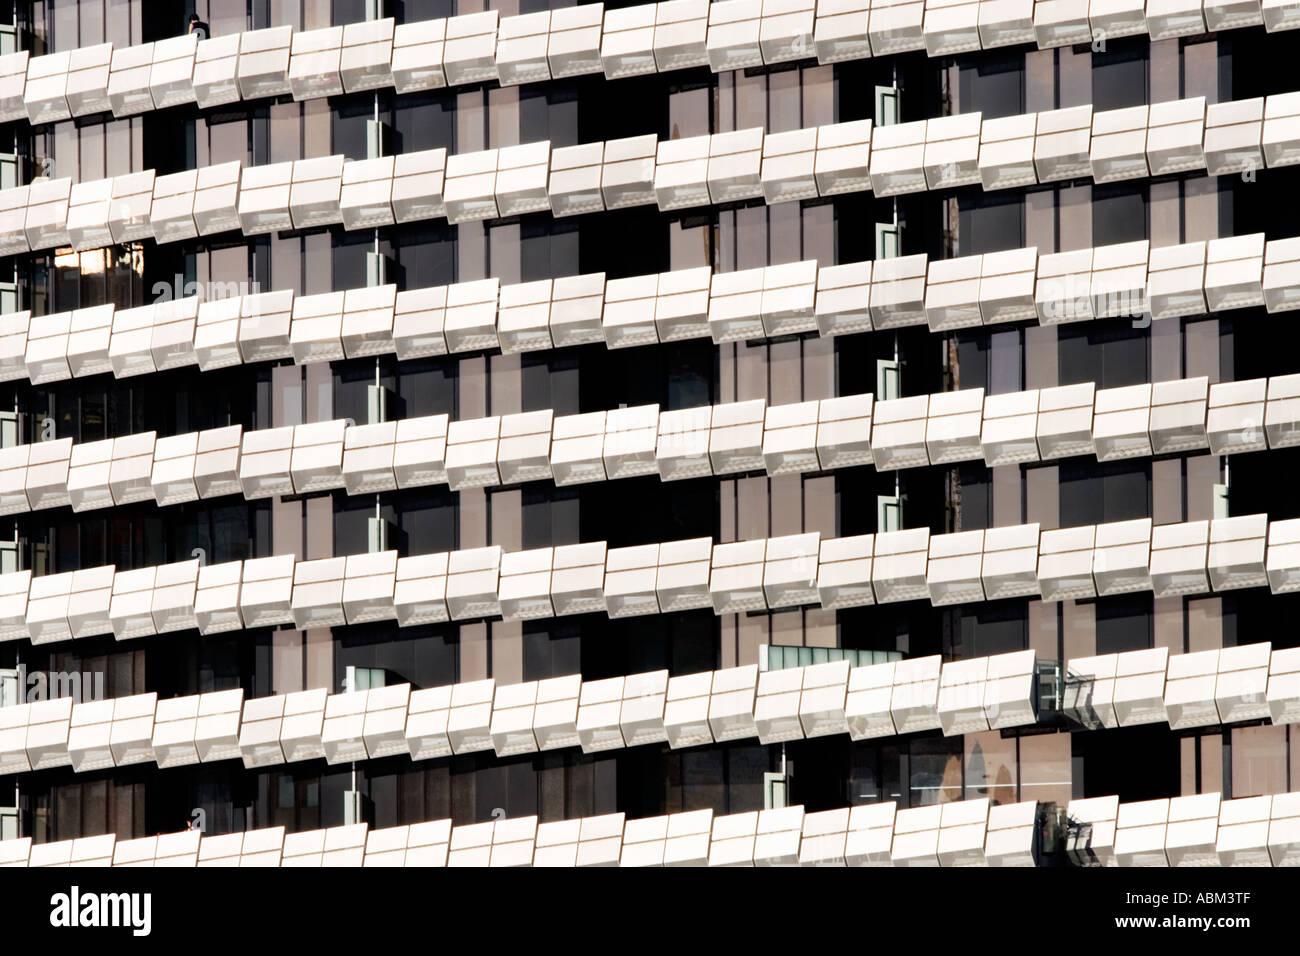 Modern Architecture / The Facade Of A Modern Apartment Building In  Melbourne Victoria Australia.